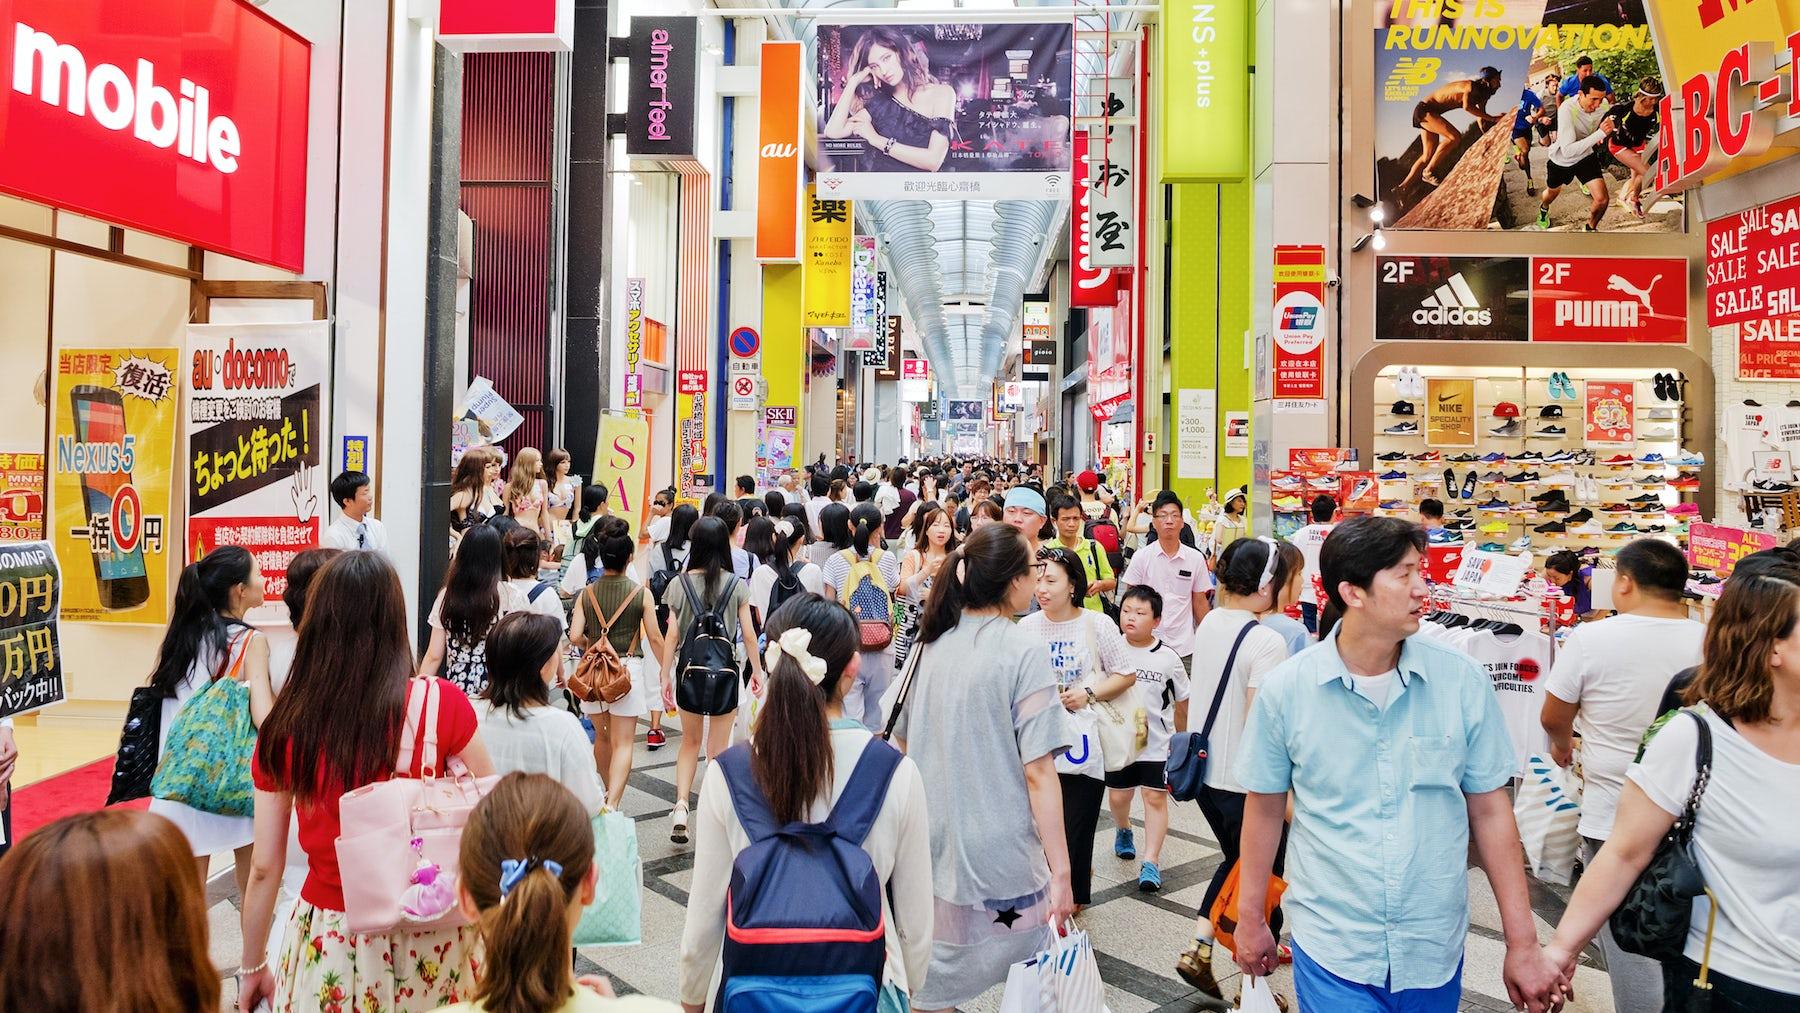 Shoppers in Dōtonbori, a tourist destination in Osaka, Japan | Source: Courtesy